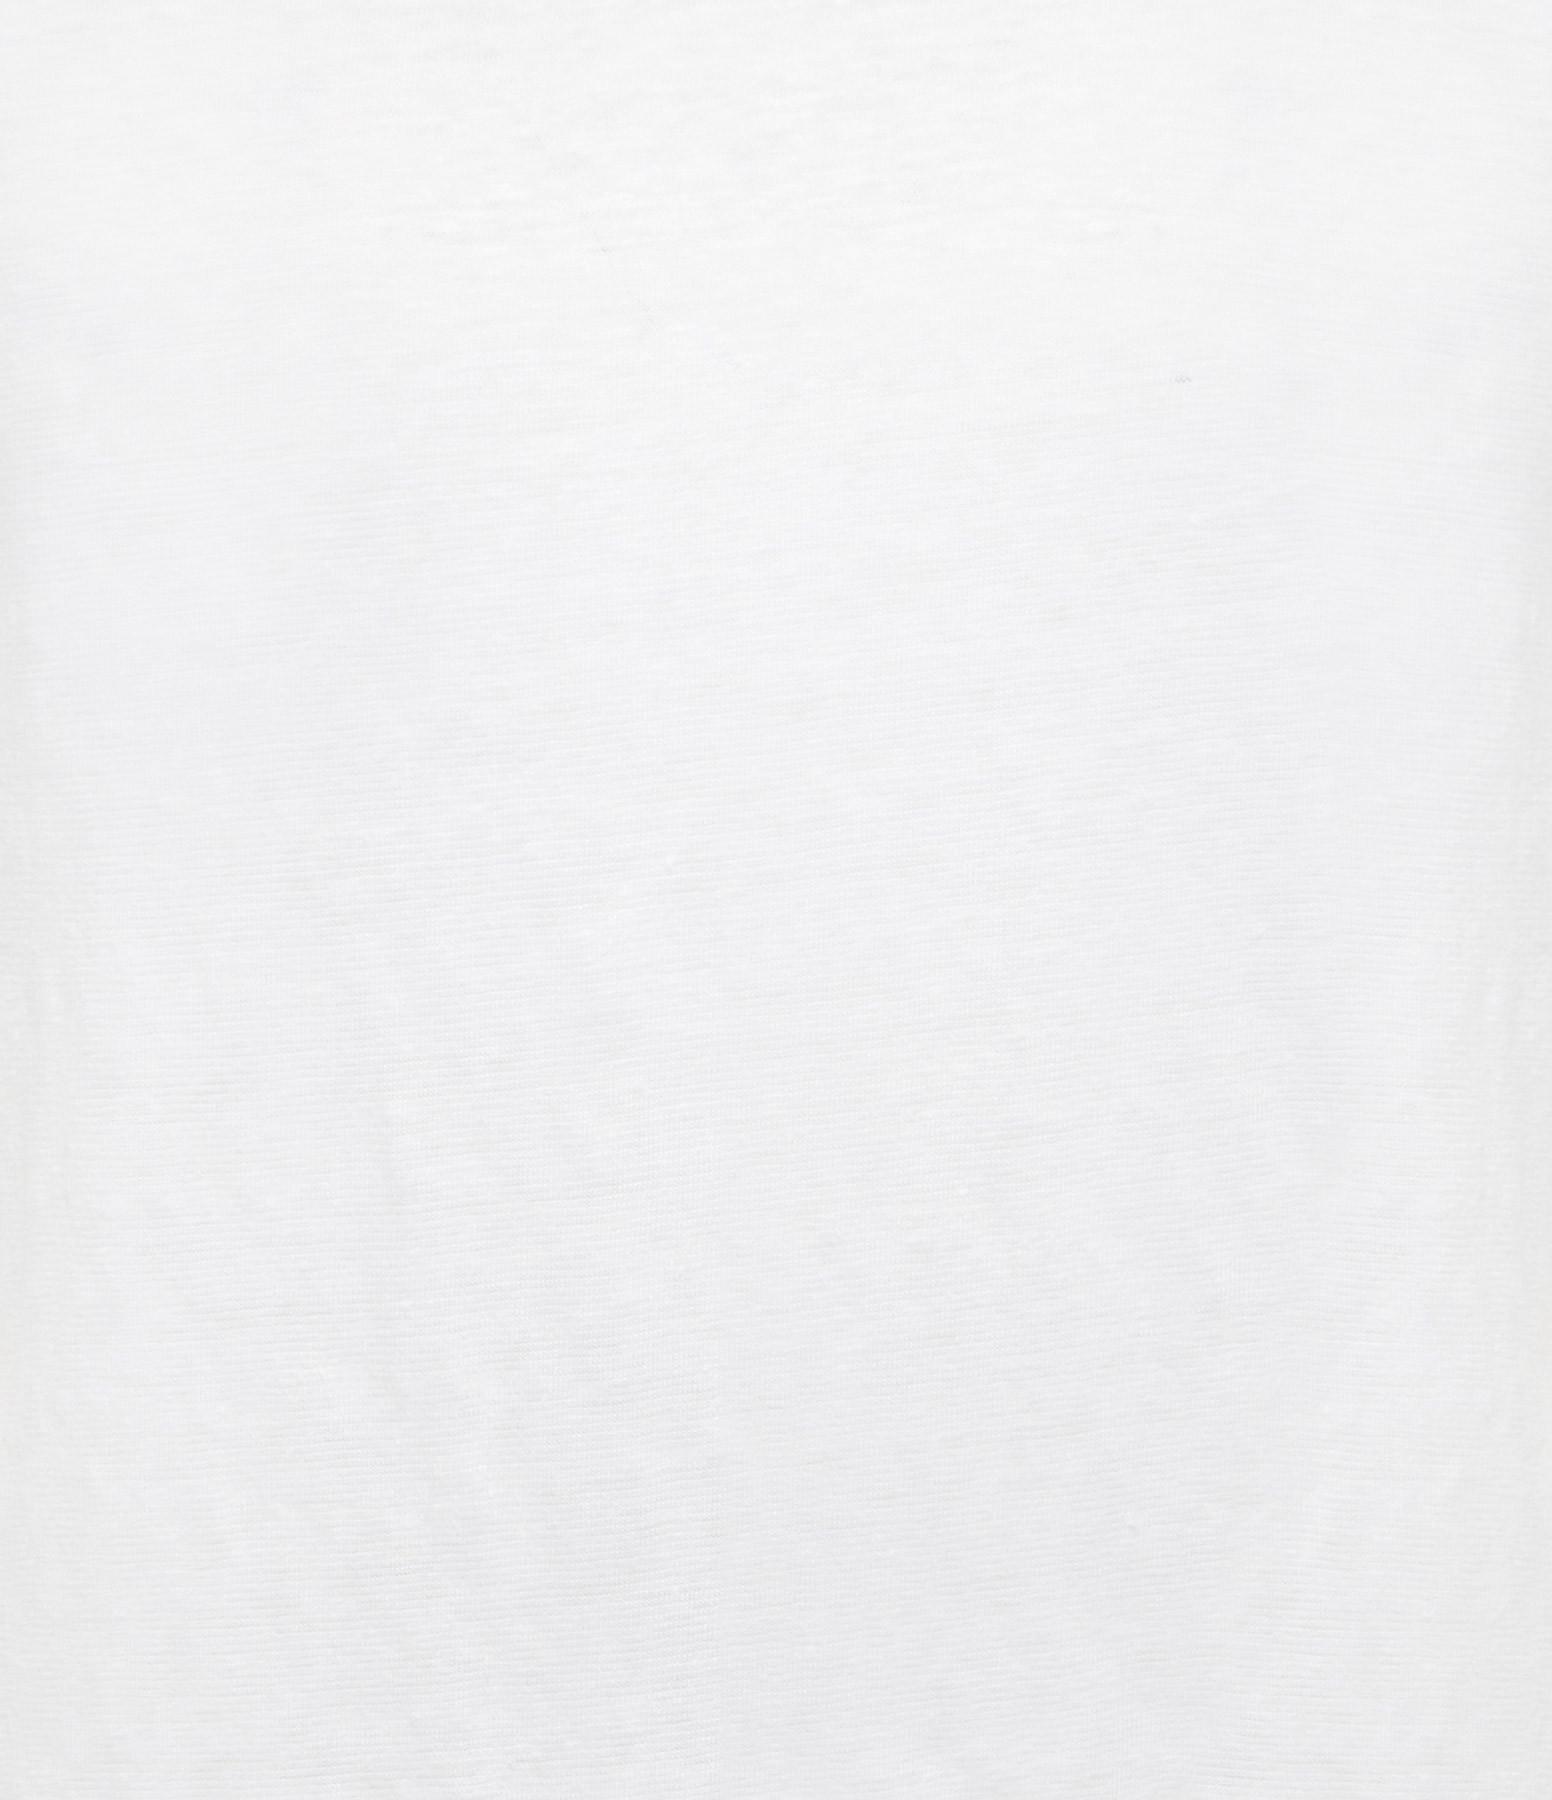 MAJESTIC FILATURES - Tee-shirt Col Rond Lin Blanc